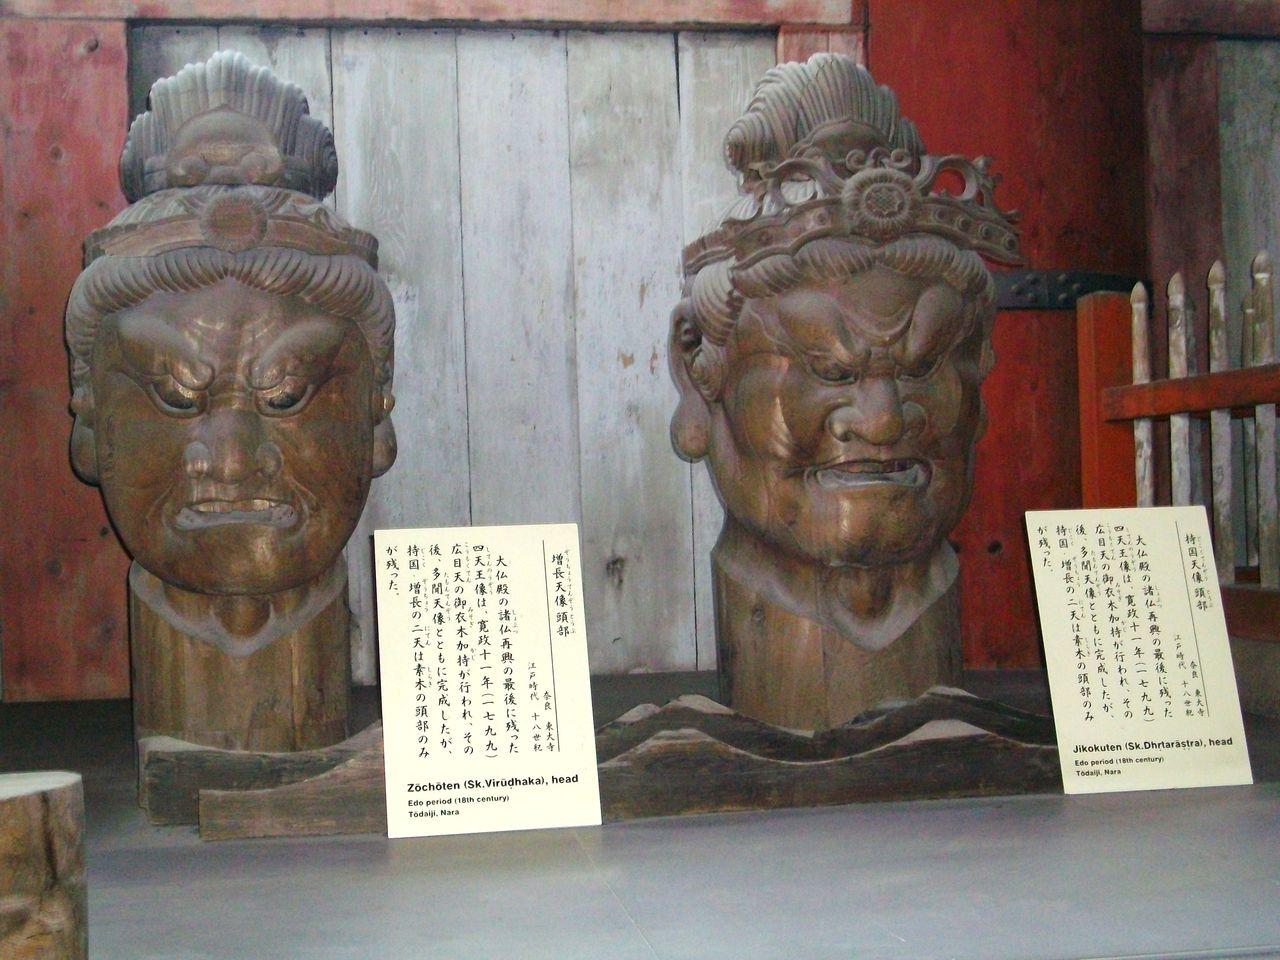 sendaisaruku 多聞天像と増長天と持国天の頭部像です。 sendaisaruku  修